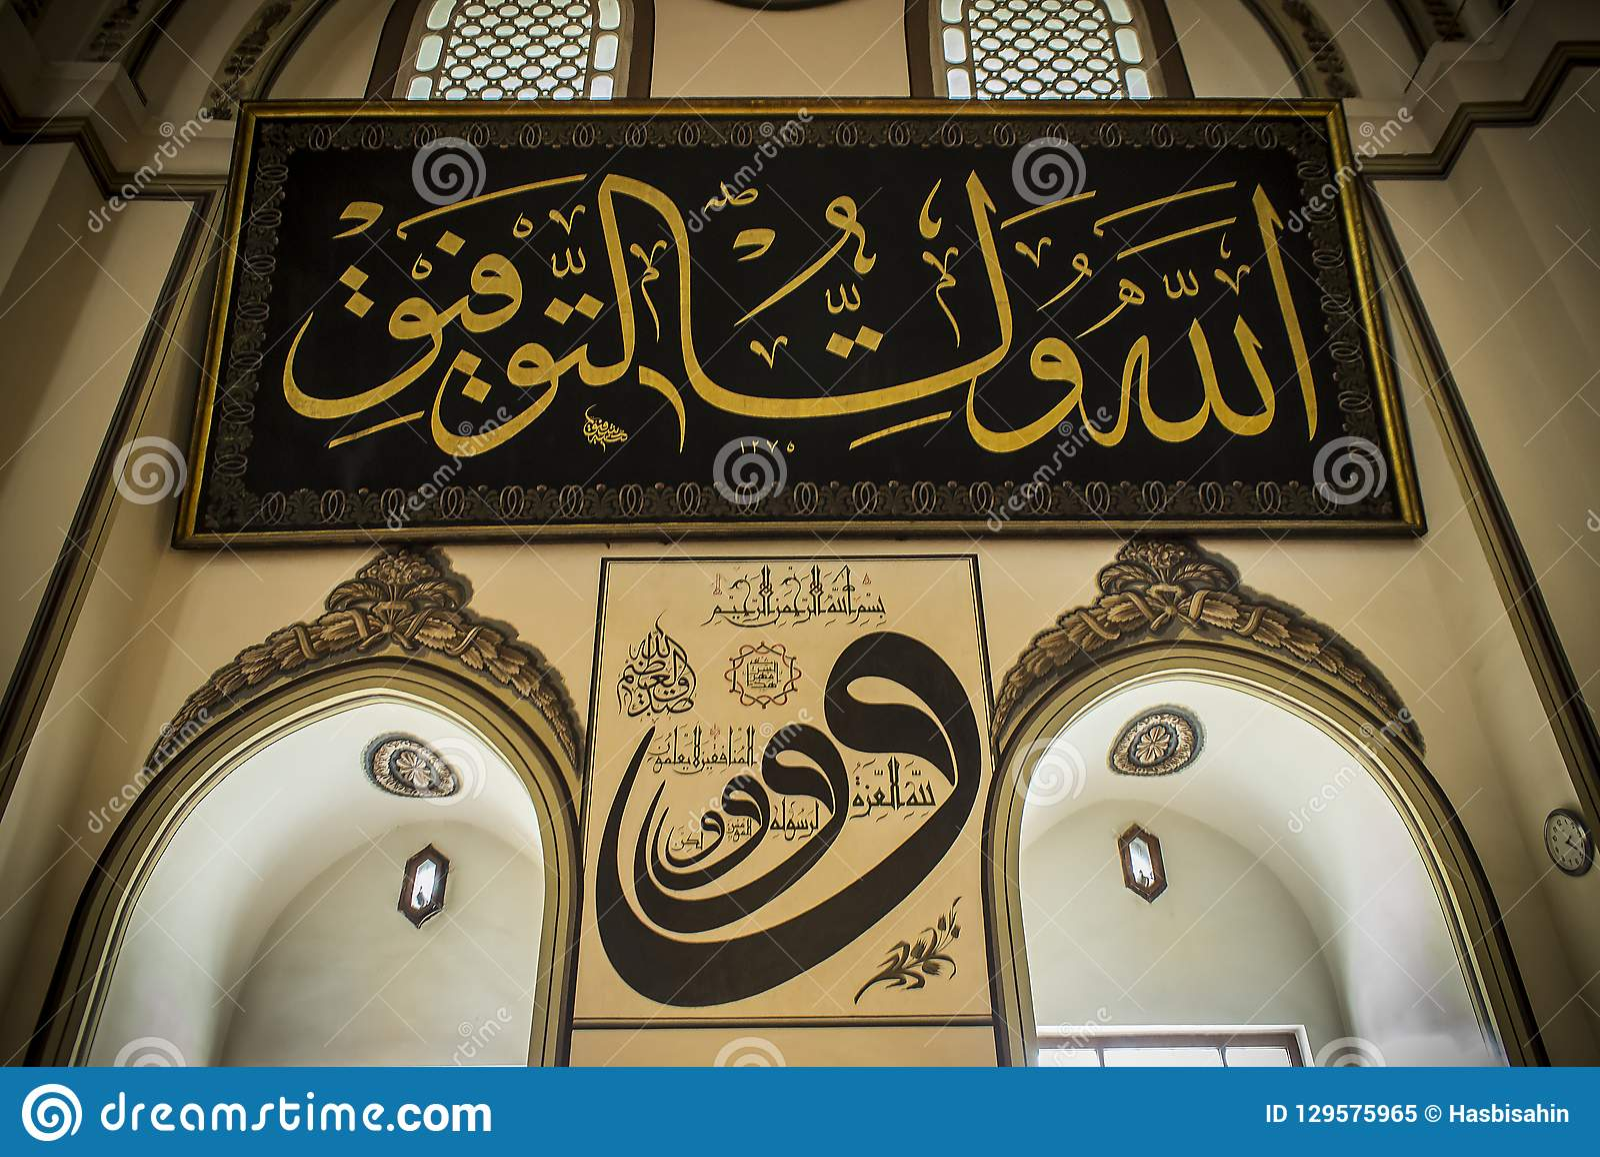 Islamitisch kalligrafieart.